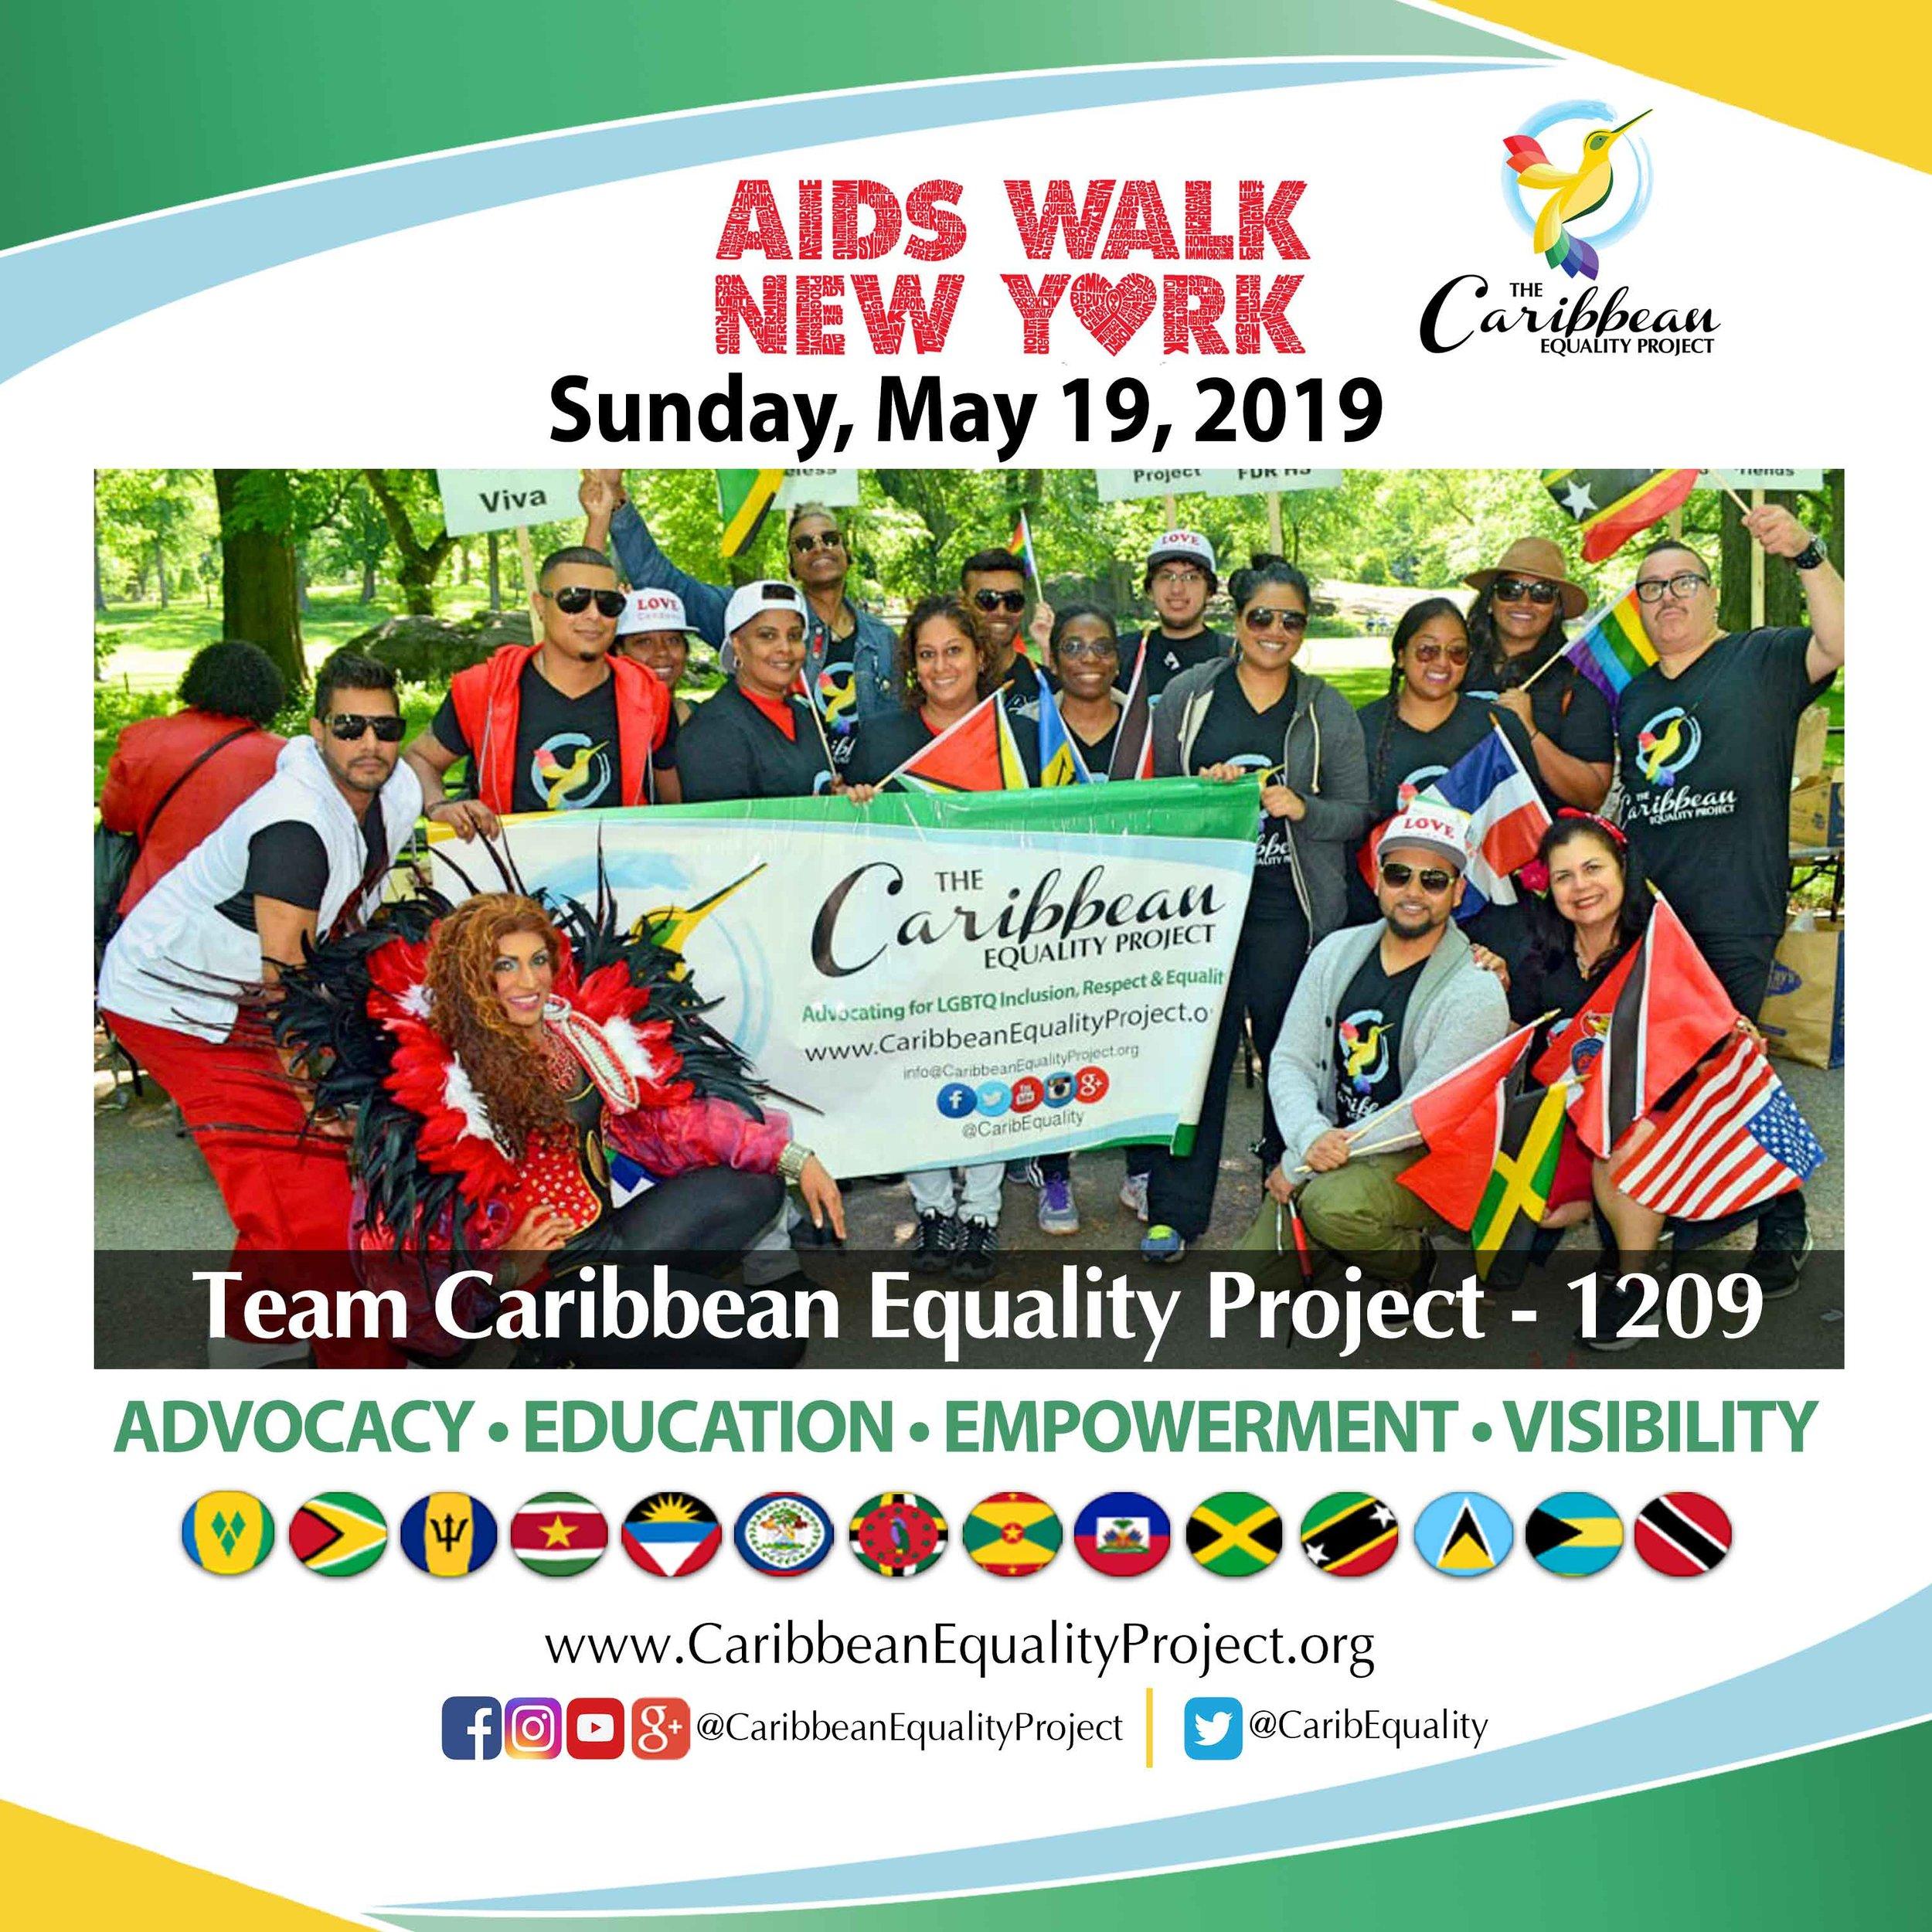 2019-CEP-AIDS-Walk-NY---Poster.jpg